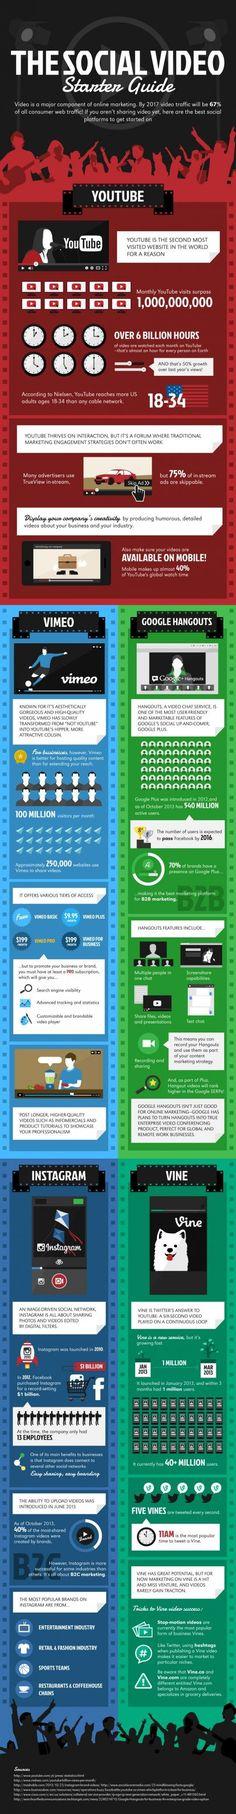 Social Video Starter Guide | Digital Resources for Net Professionals